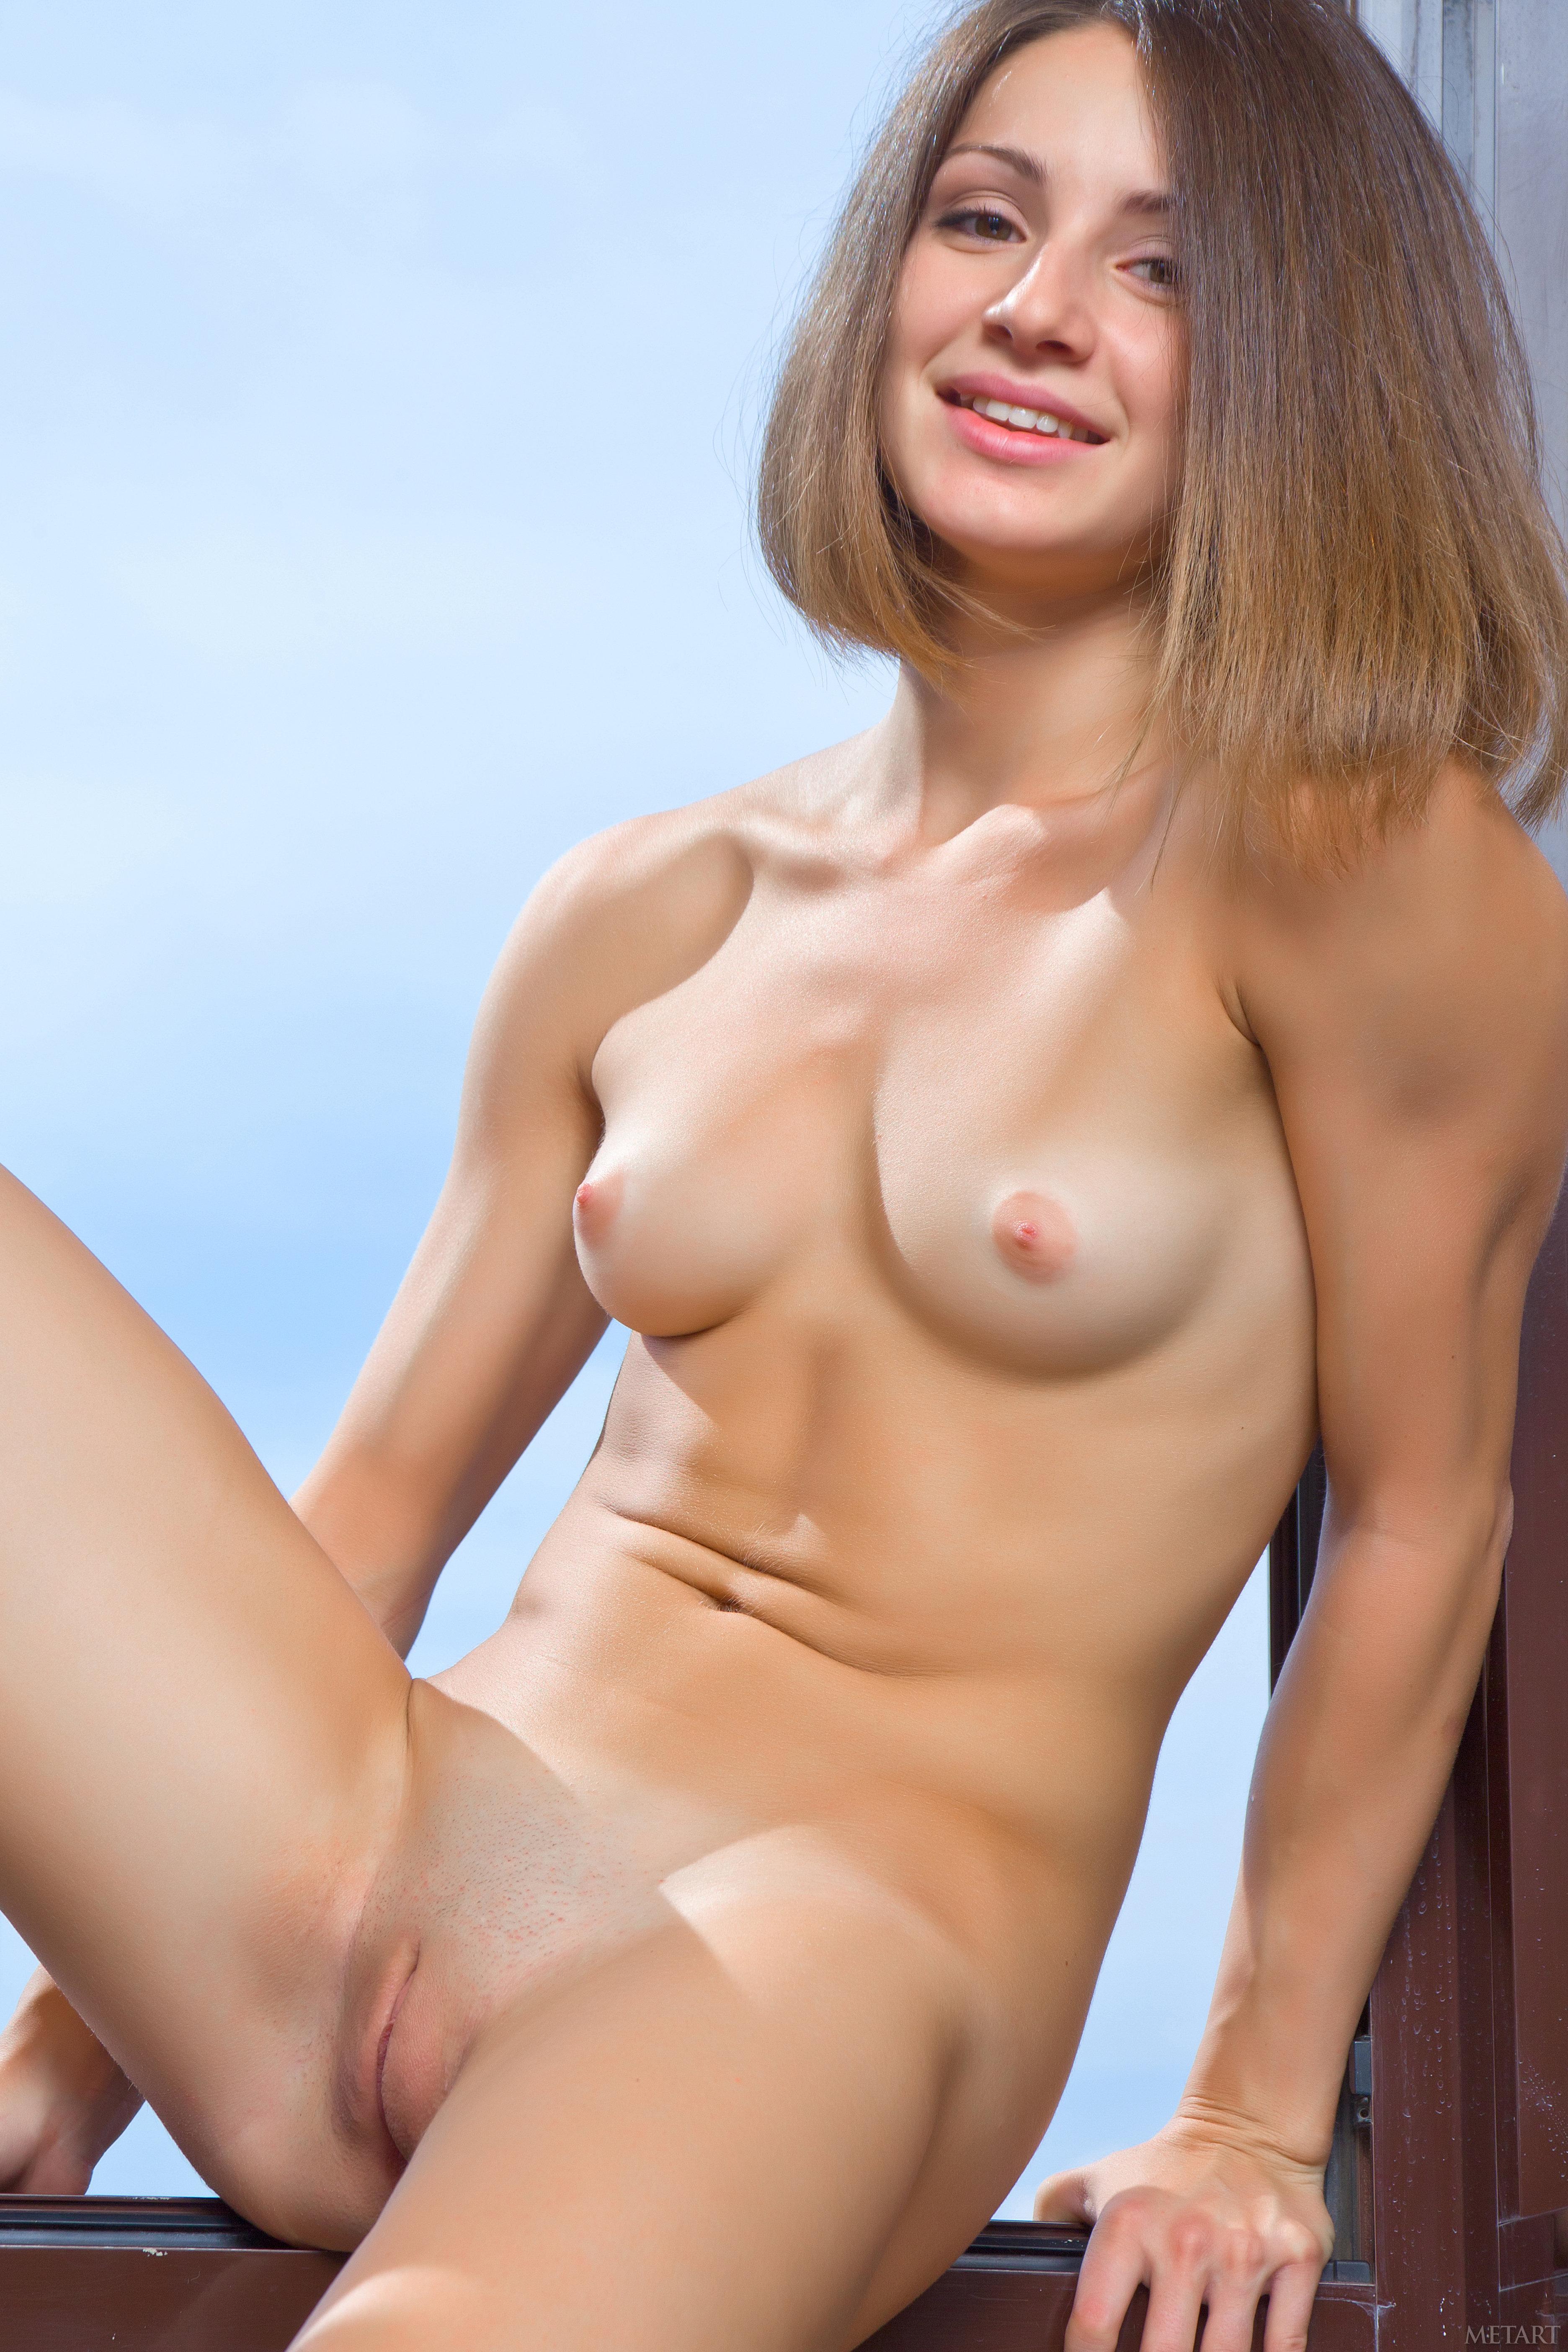 Susana C